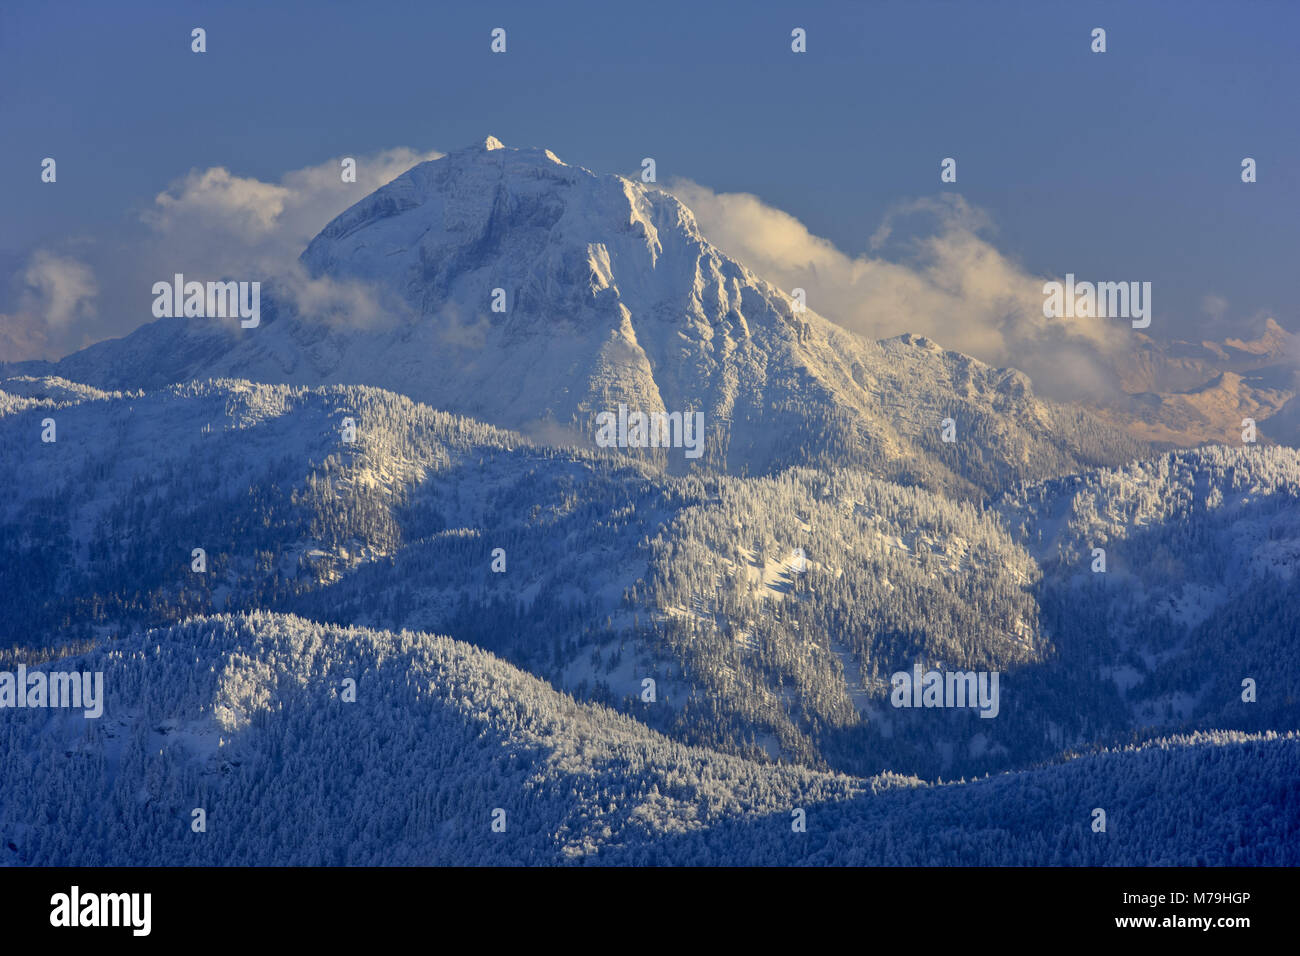 Allemagne, Berlin, Isarwinkel, Alpes bavaroises, Brauneck, Guffert, Autriche, Tyrol, Banque D'Images